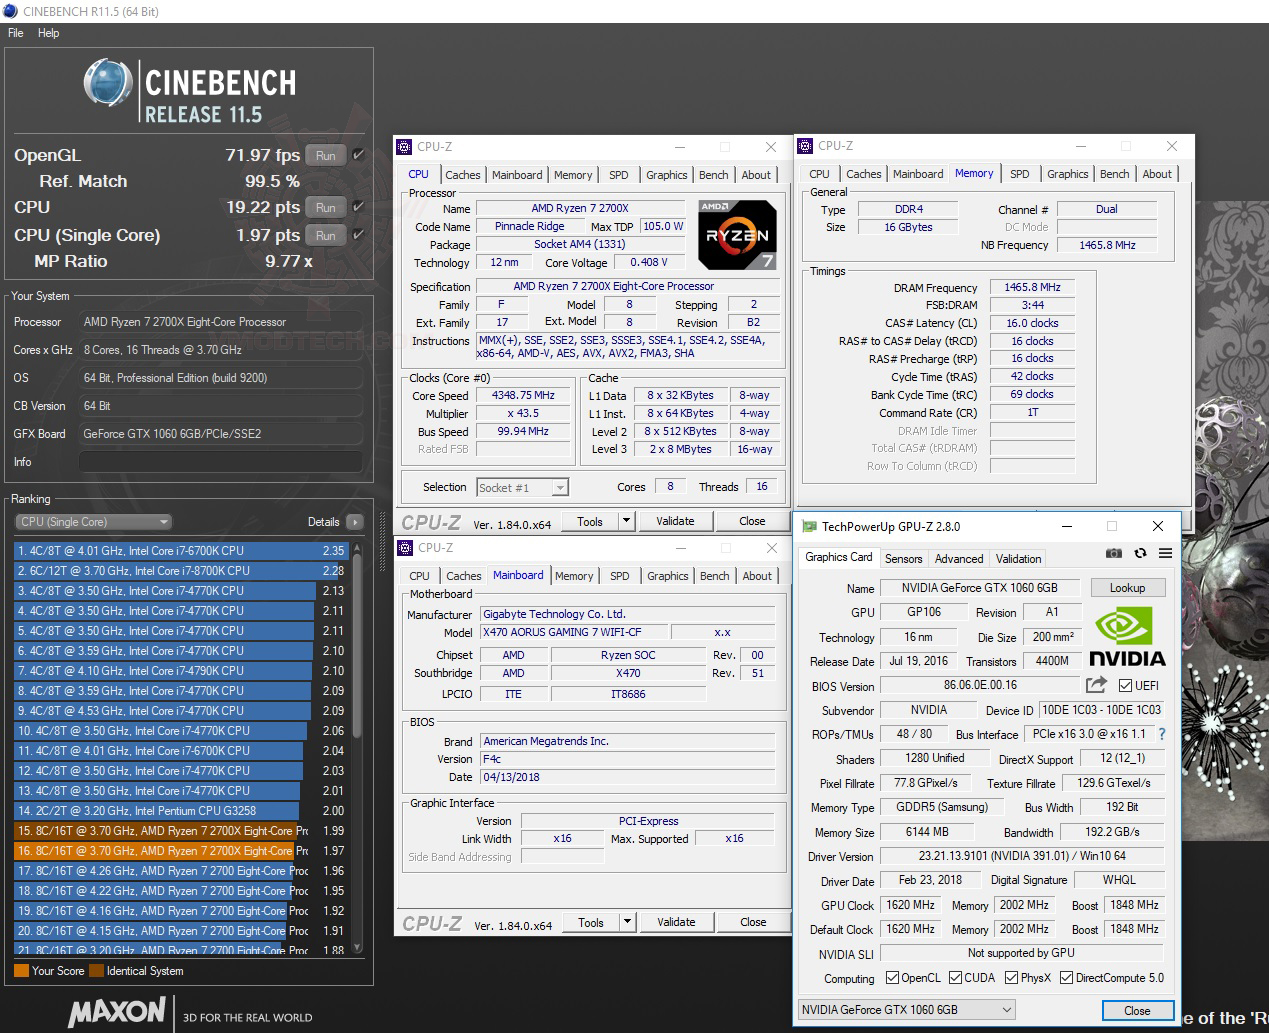 c11 AMD RYZEN 7 2700X PROCESSOR REVIEW